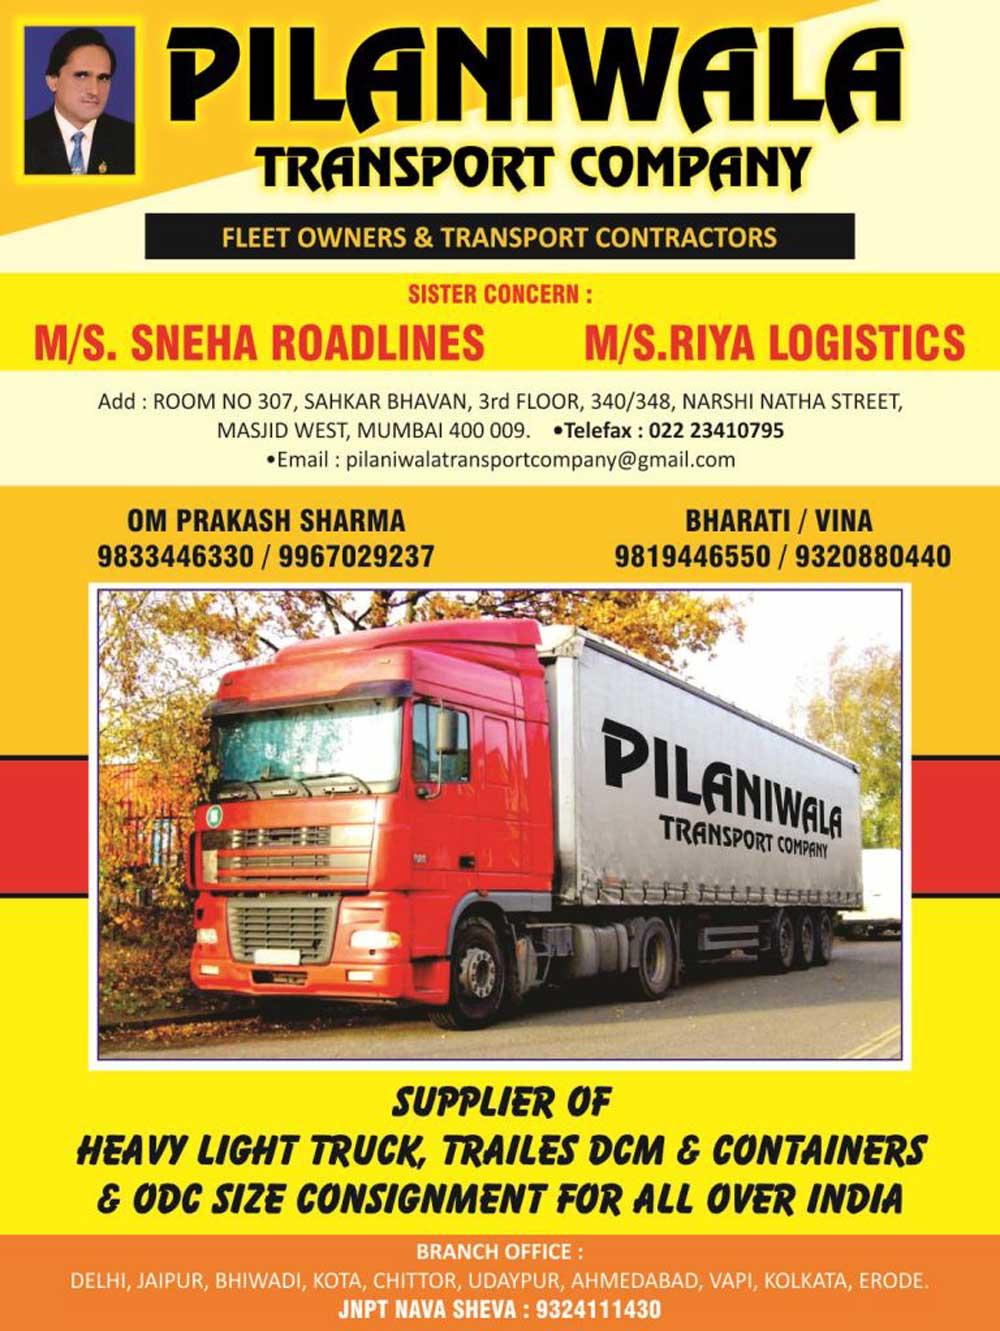 Pilaniwala Transport Company